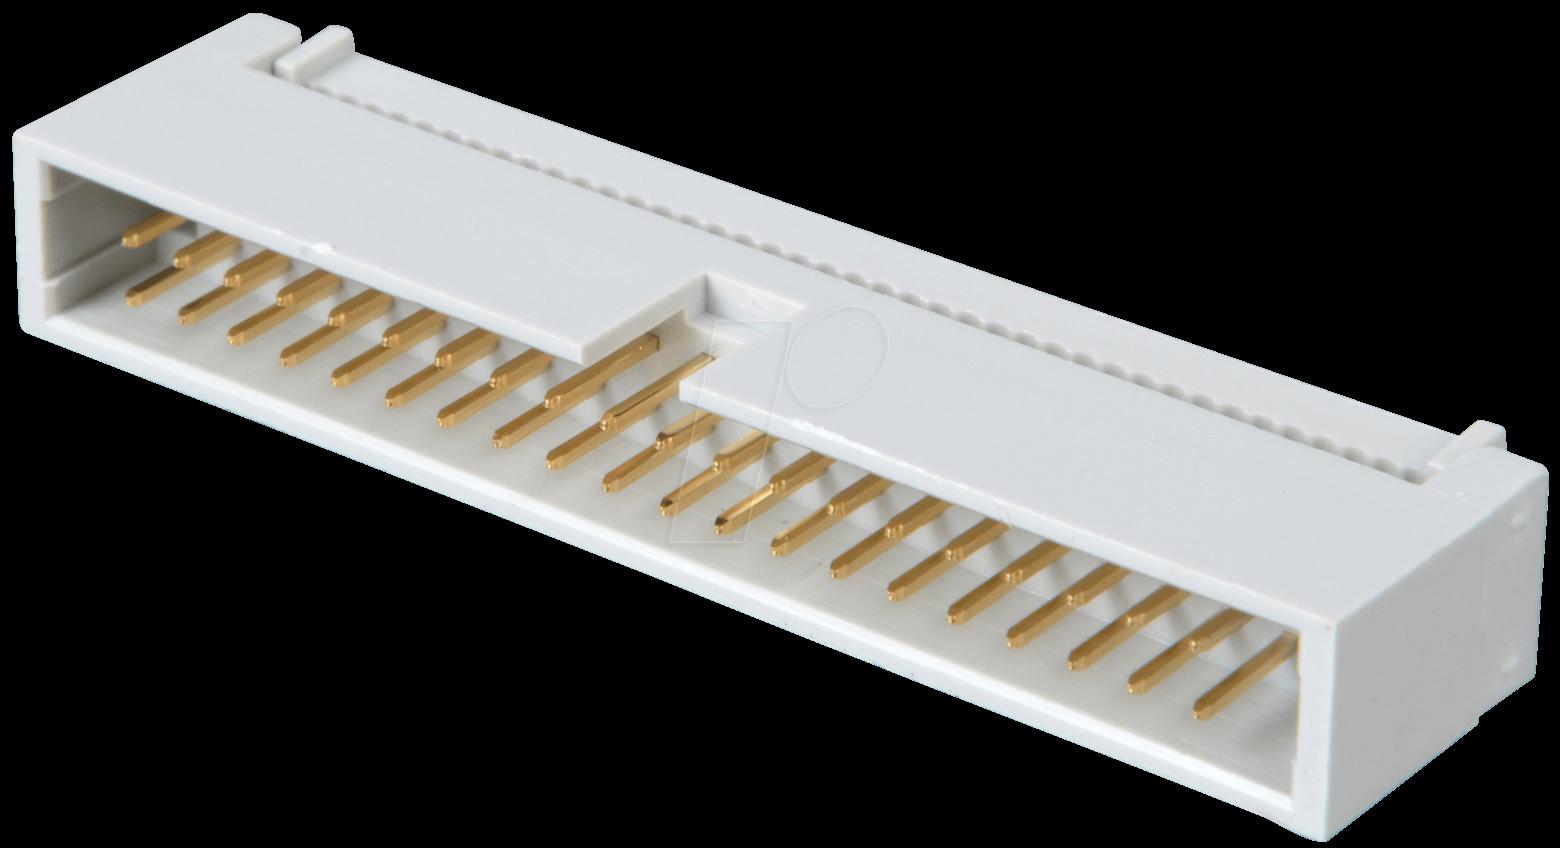 wsl 40sk wannenstecker 40 polig schneidklemmtechnik bei reichelt elektronik. Black Bedroom Furniture Sets. Home Design Ideas